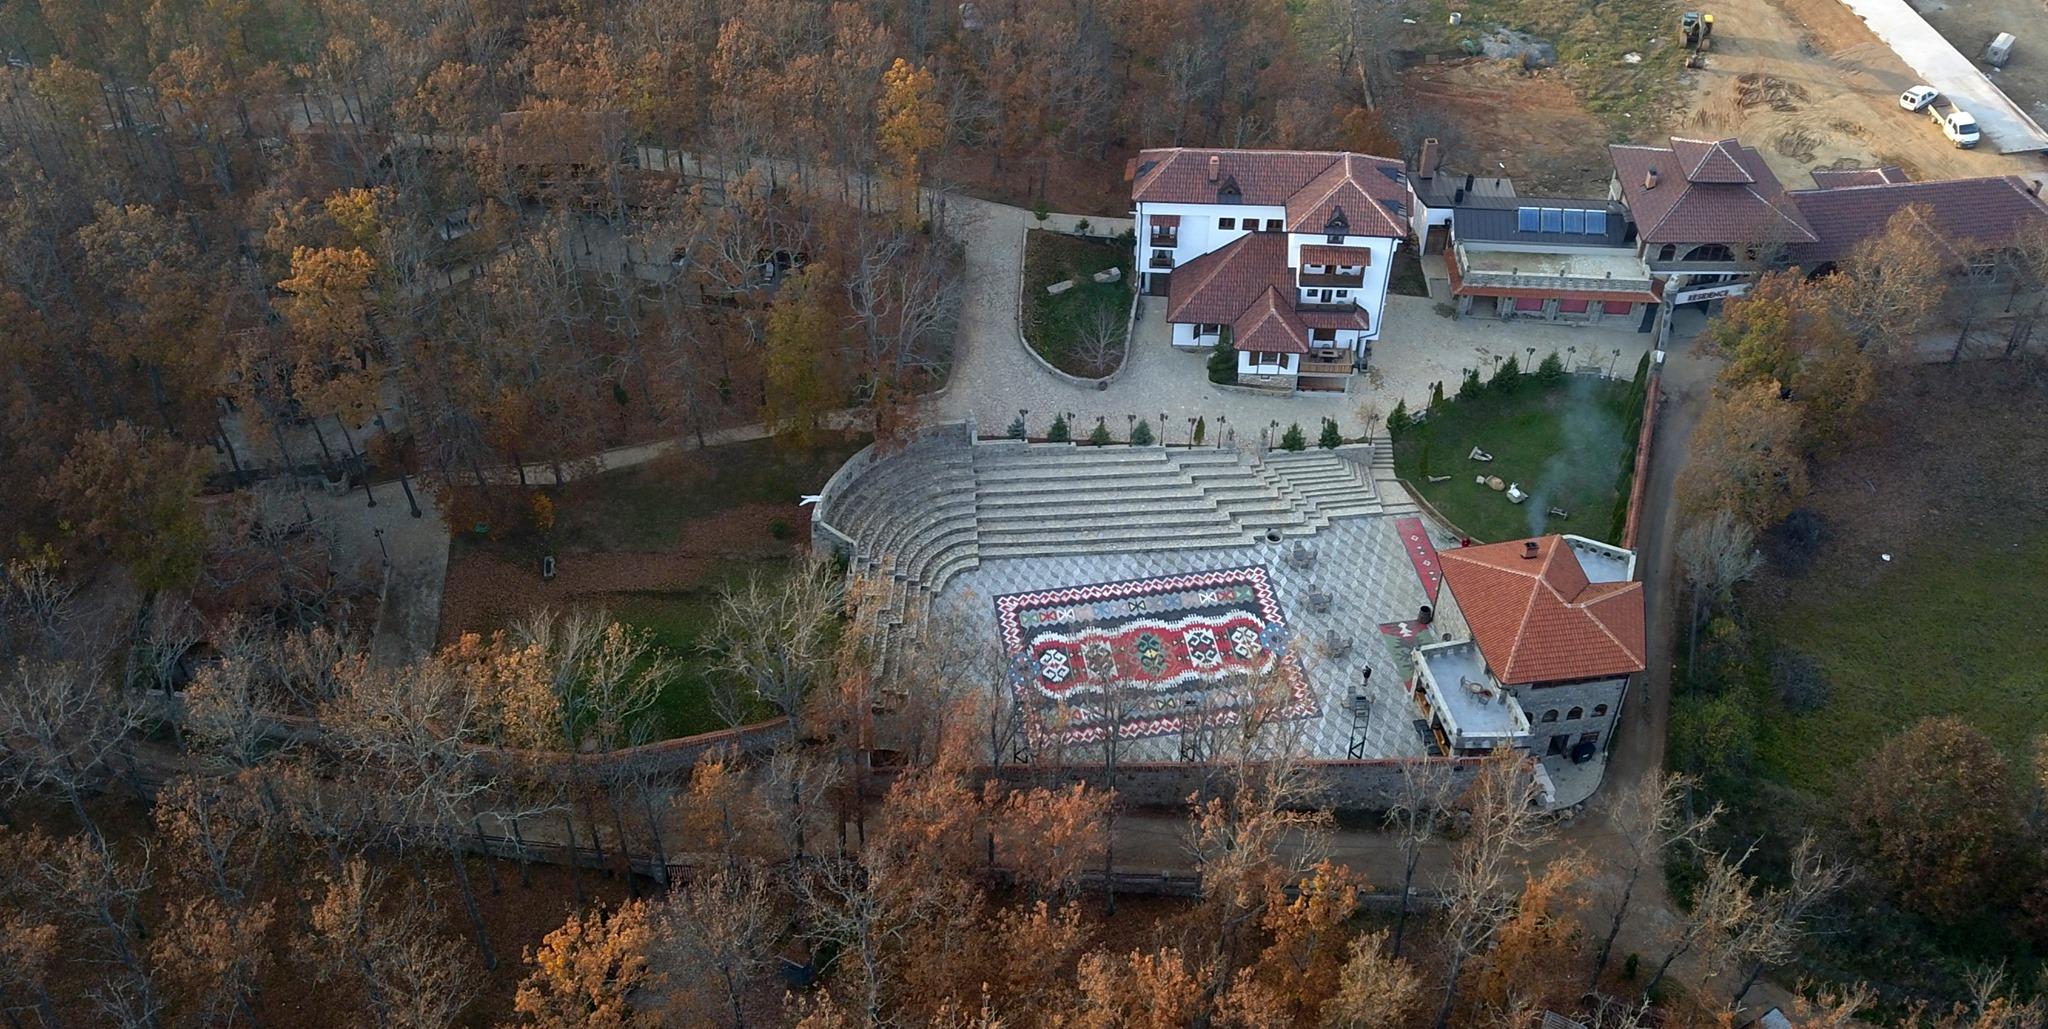 Kulla e Gjinajve, Gjilan